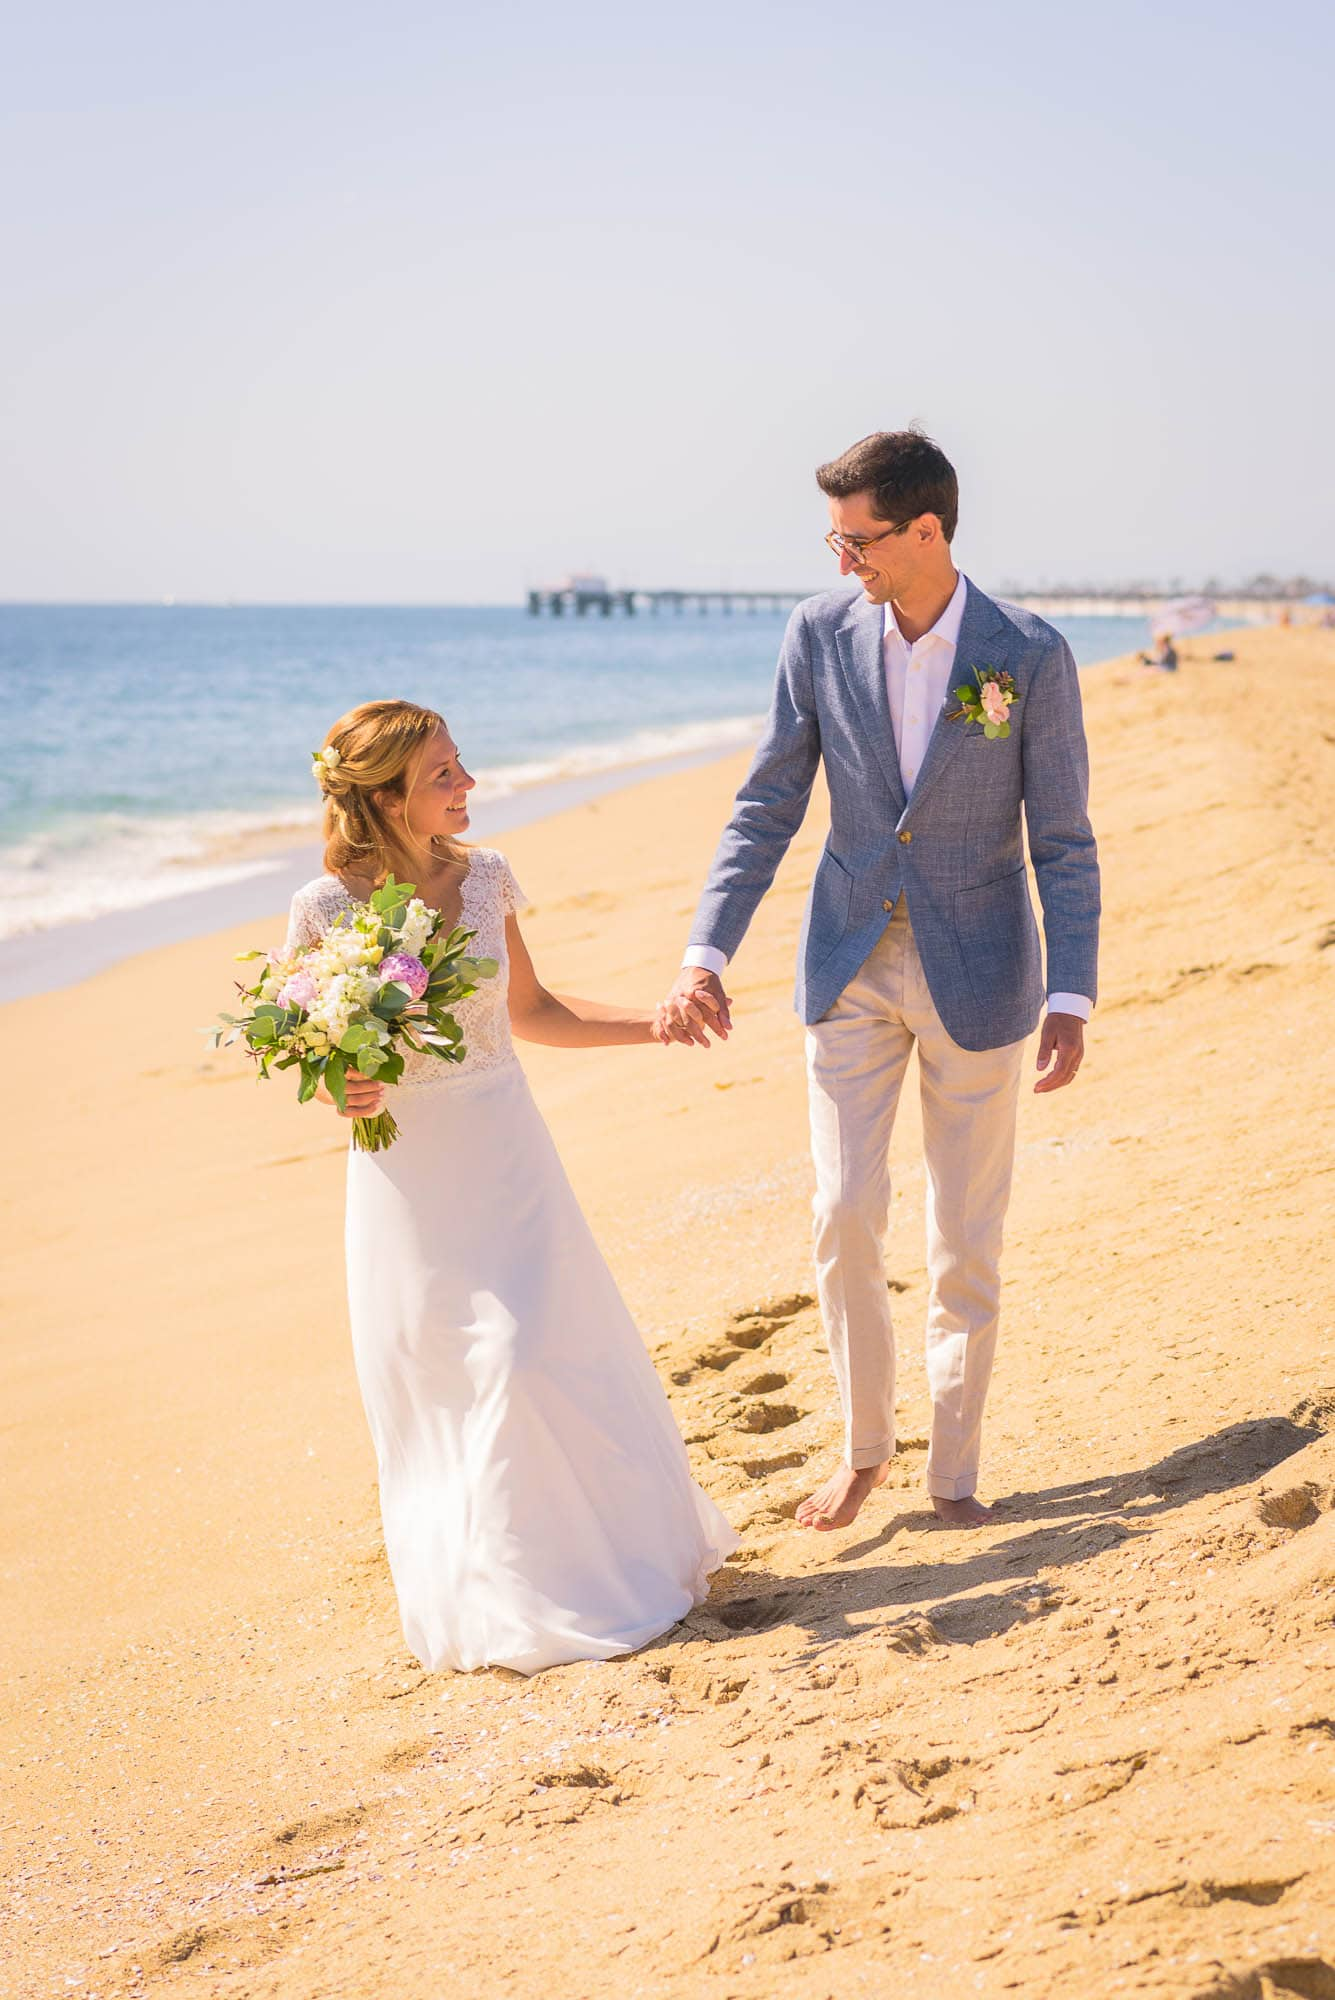 042_Alan_and_Heidi_Wedding_Verena_Andreas